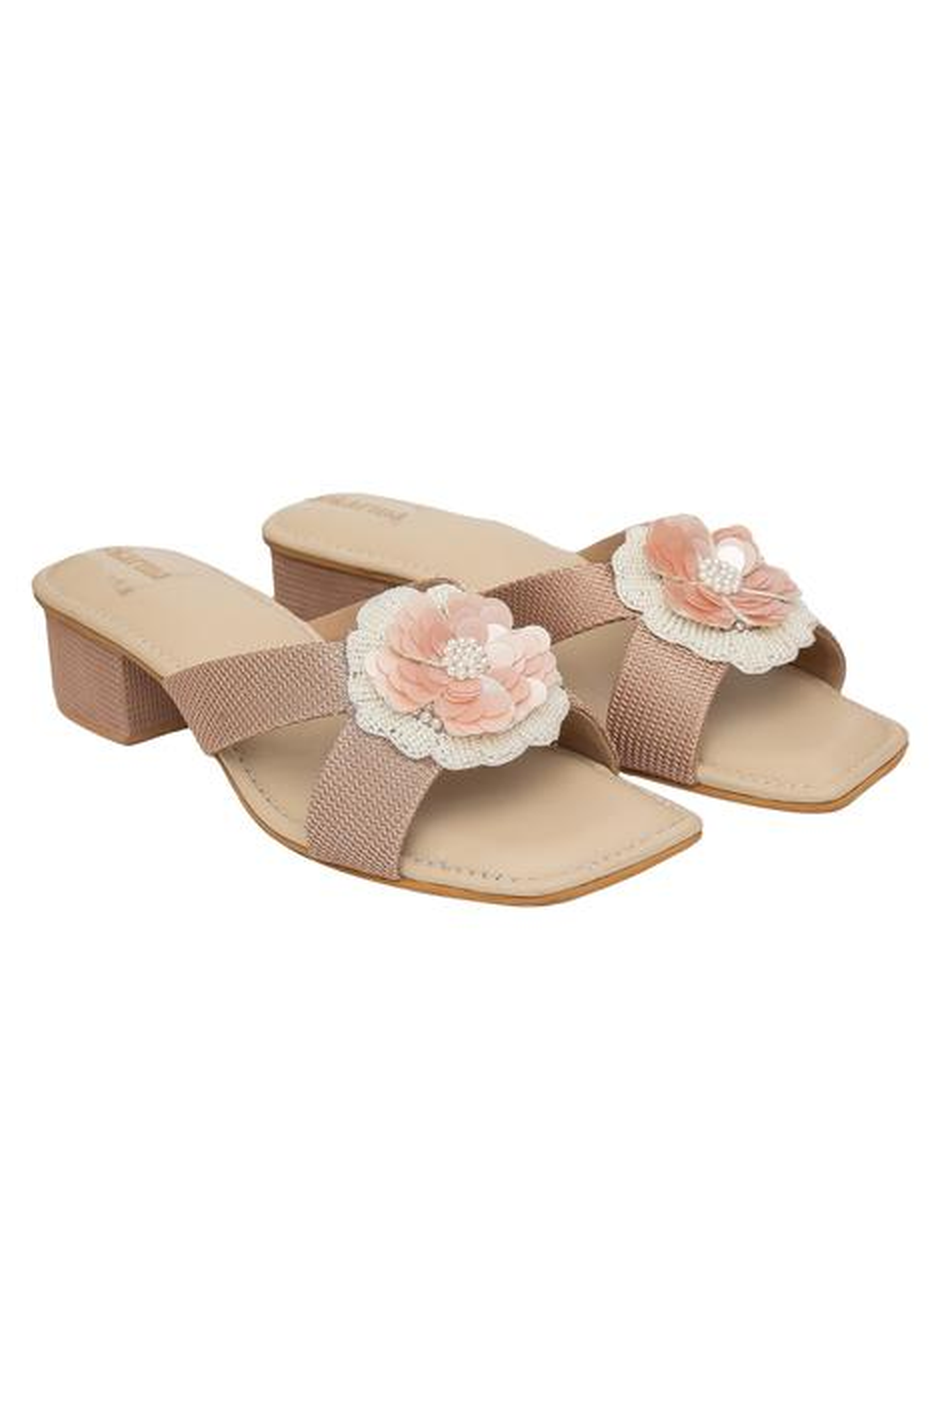 Madno Floral Block Heels